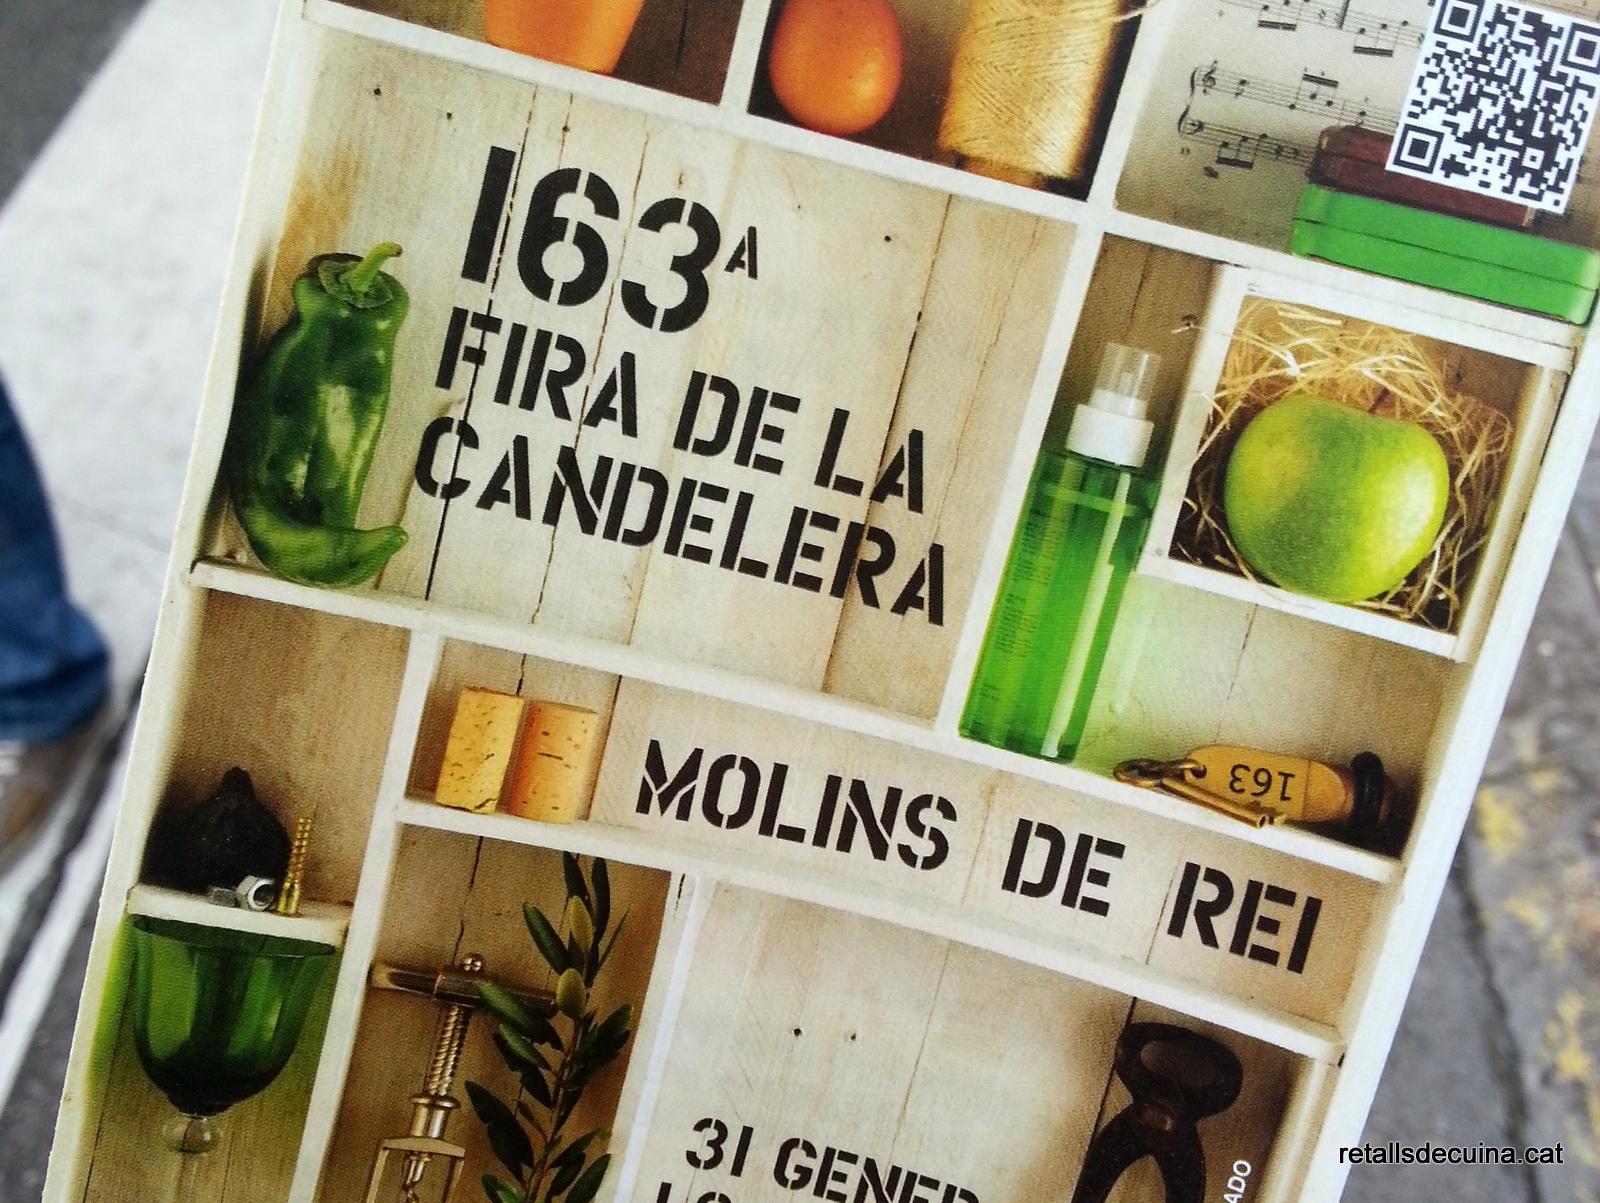 163ª Fira de la Candelera